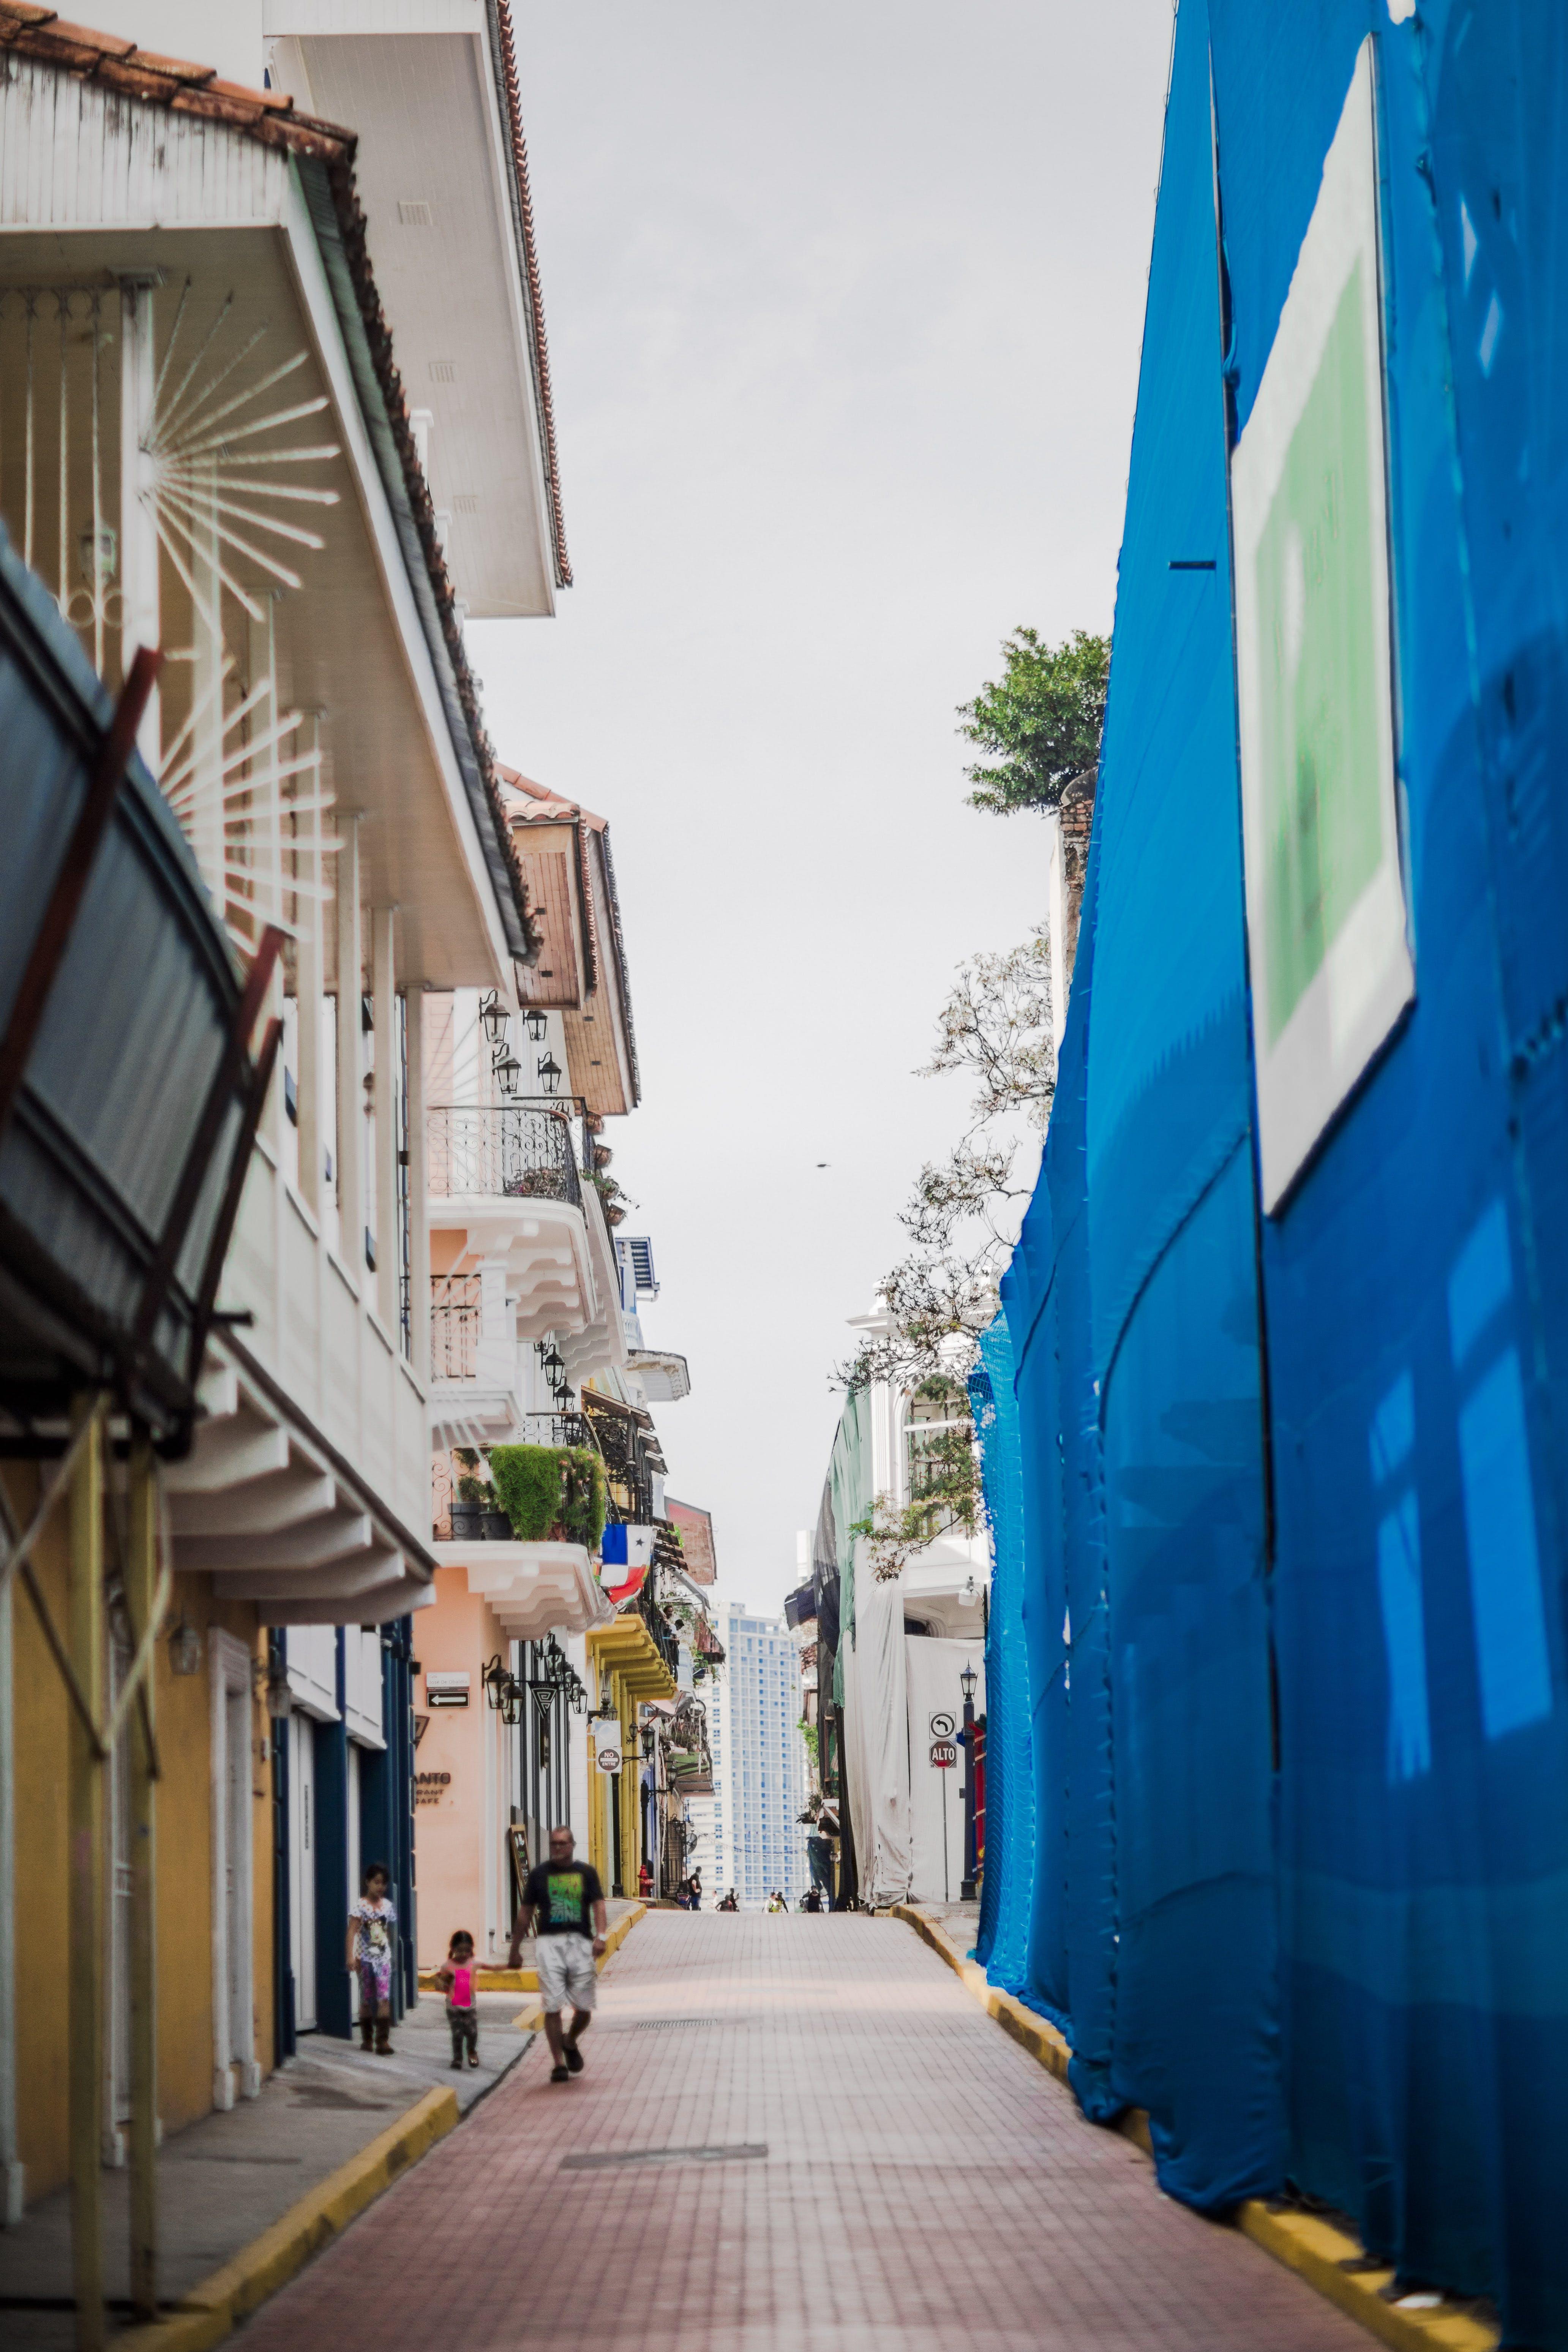 Foto stok gratis bangunan tua, bendera, casco viejo, komposisi fotografi